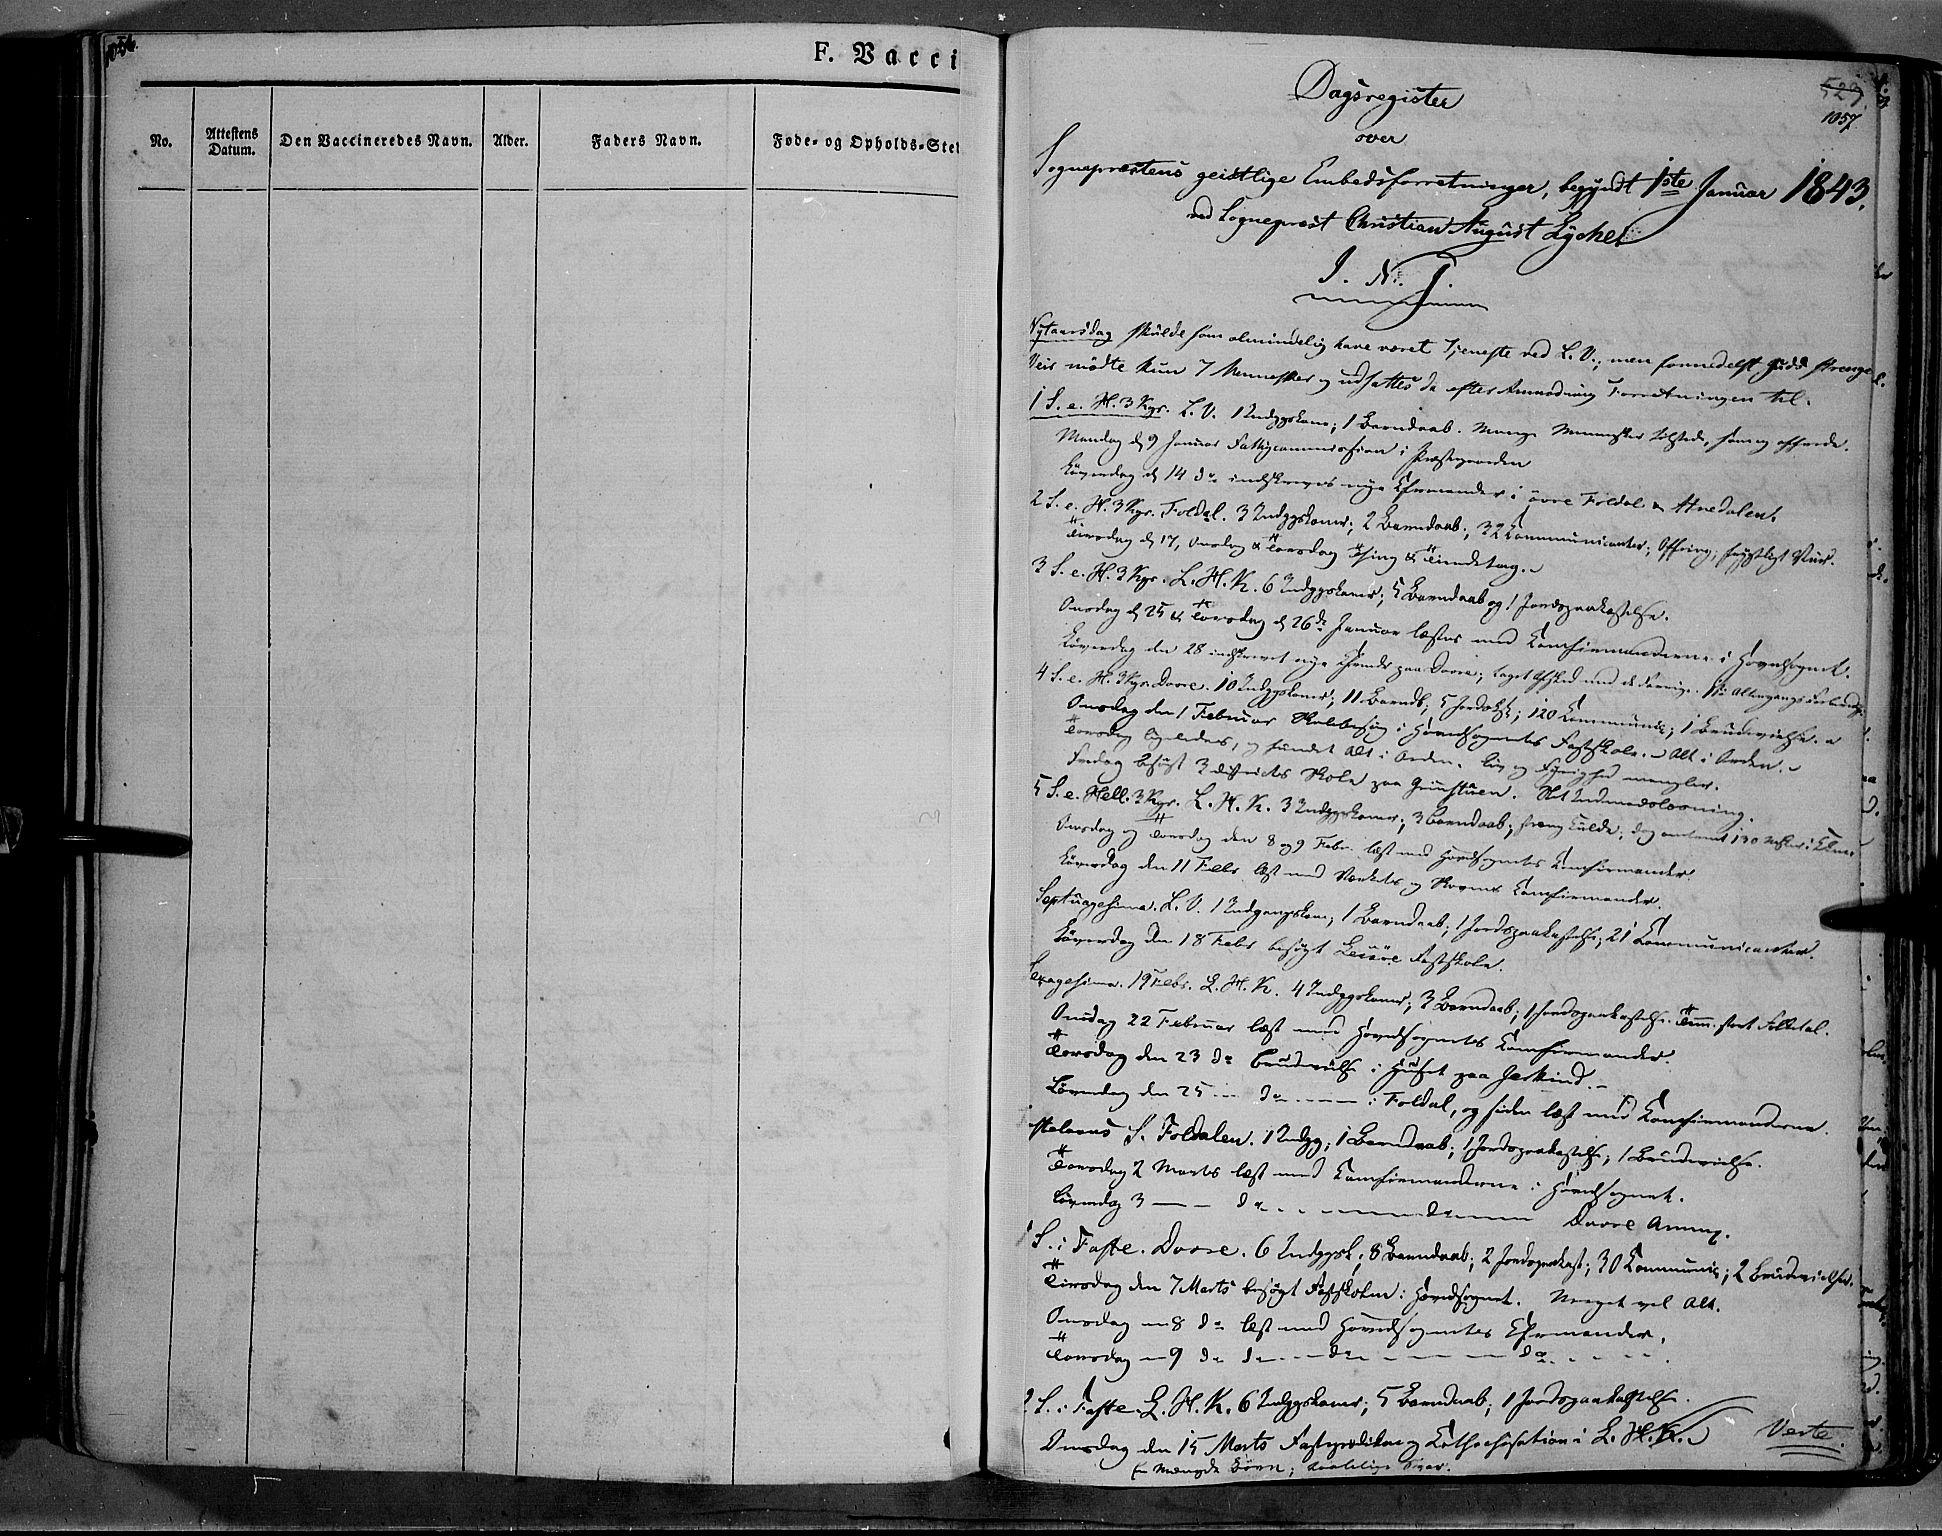 SAH, Lesja prestekontor, Ministerialbok nr. 6B, 1843-1854, s. 1056-1057